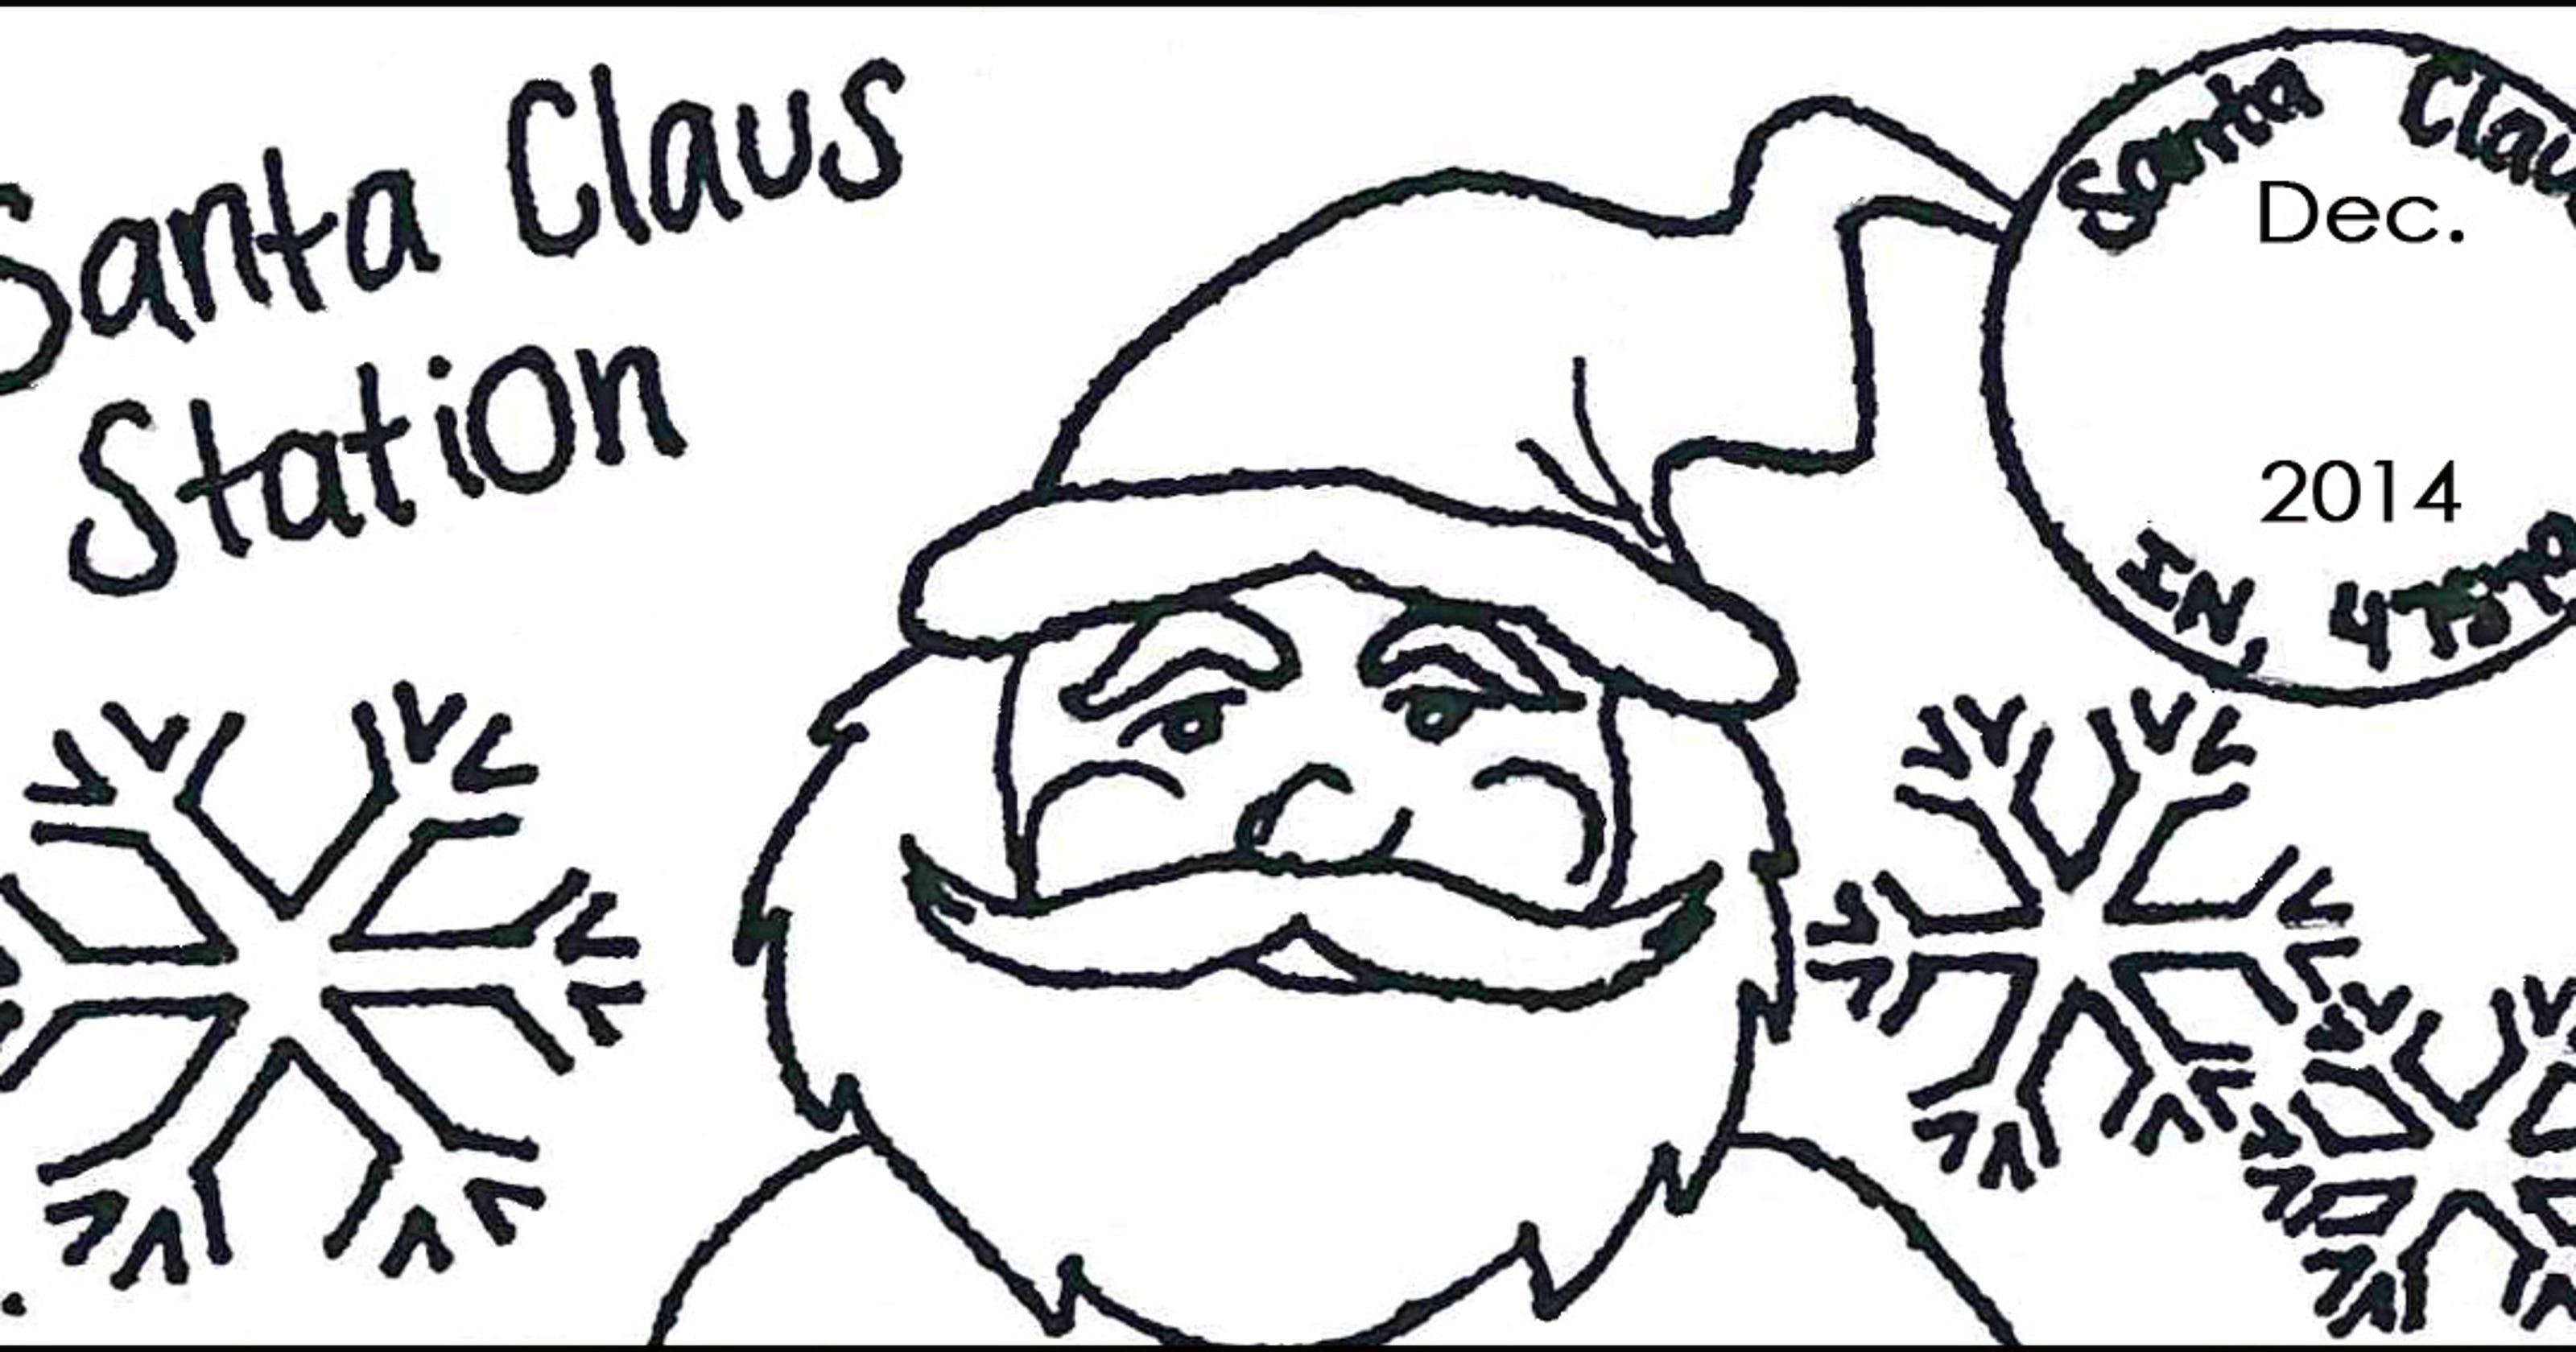 Official Santa Claus postmark available Dec. 1